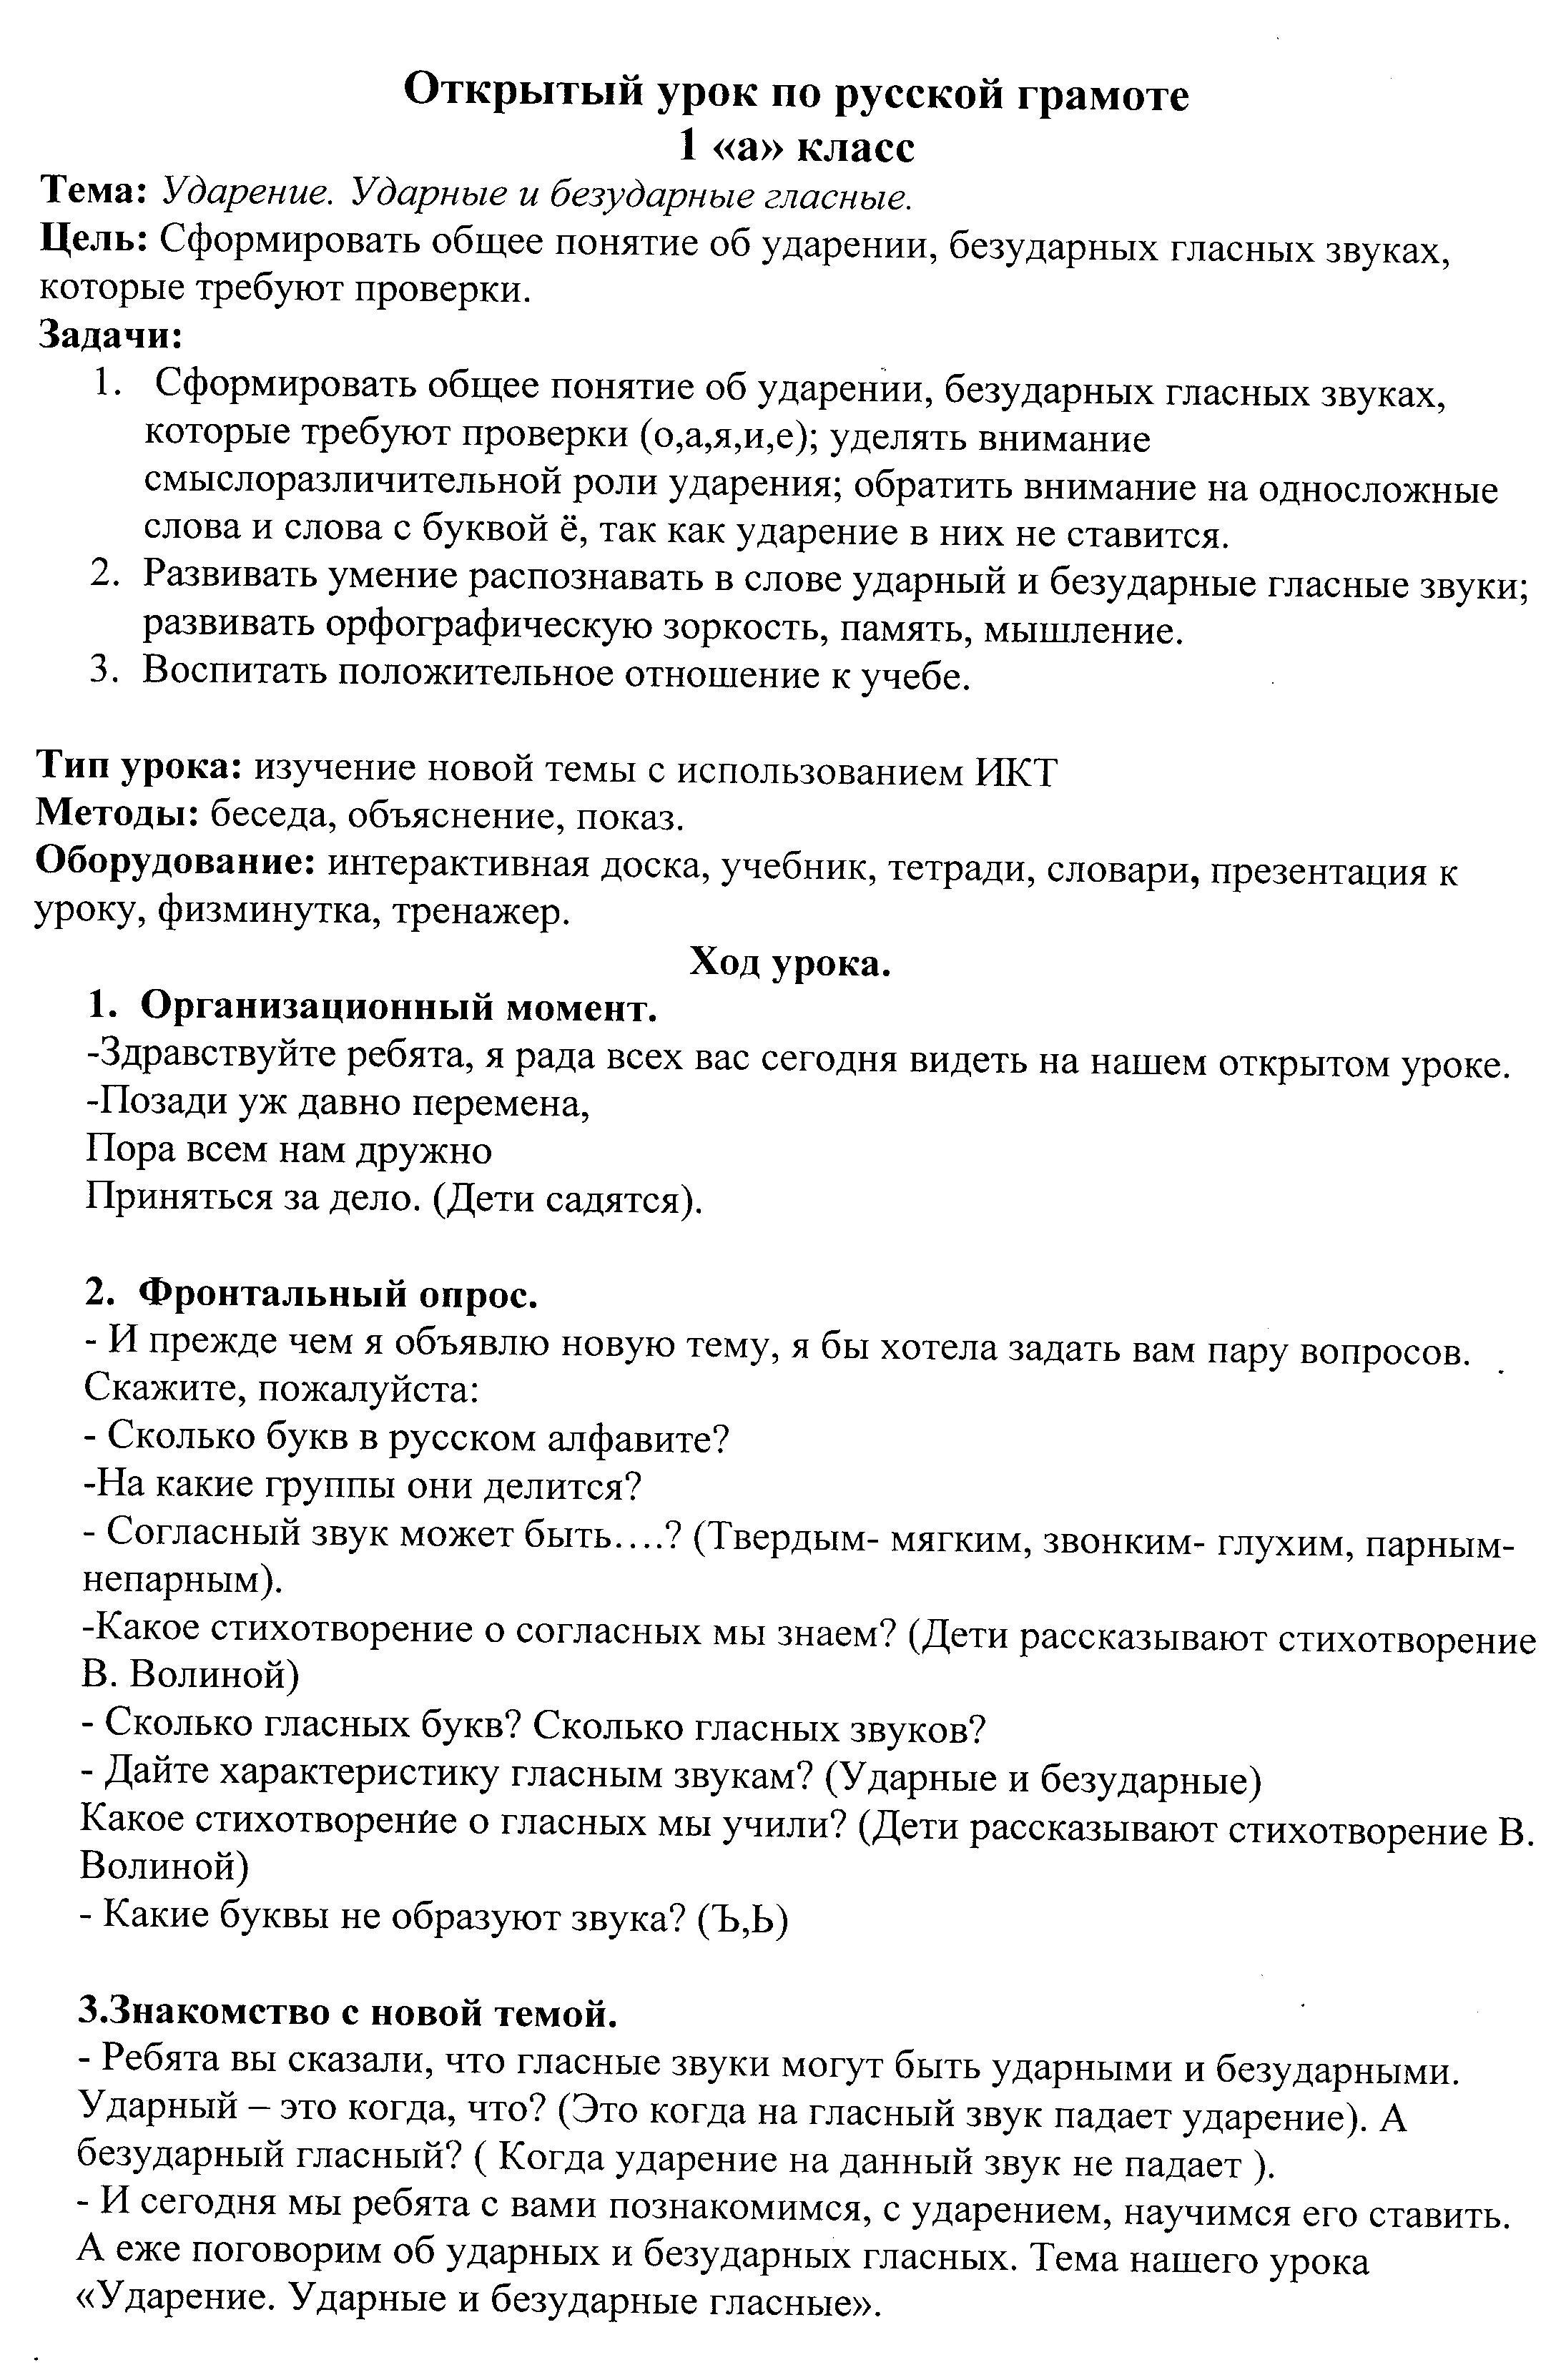 C:\Documents and Settings\оао\Рабочий стол\разработки отк меропр нач кл\откр ур рус\урок рус1.jpg